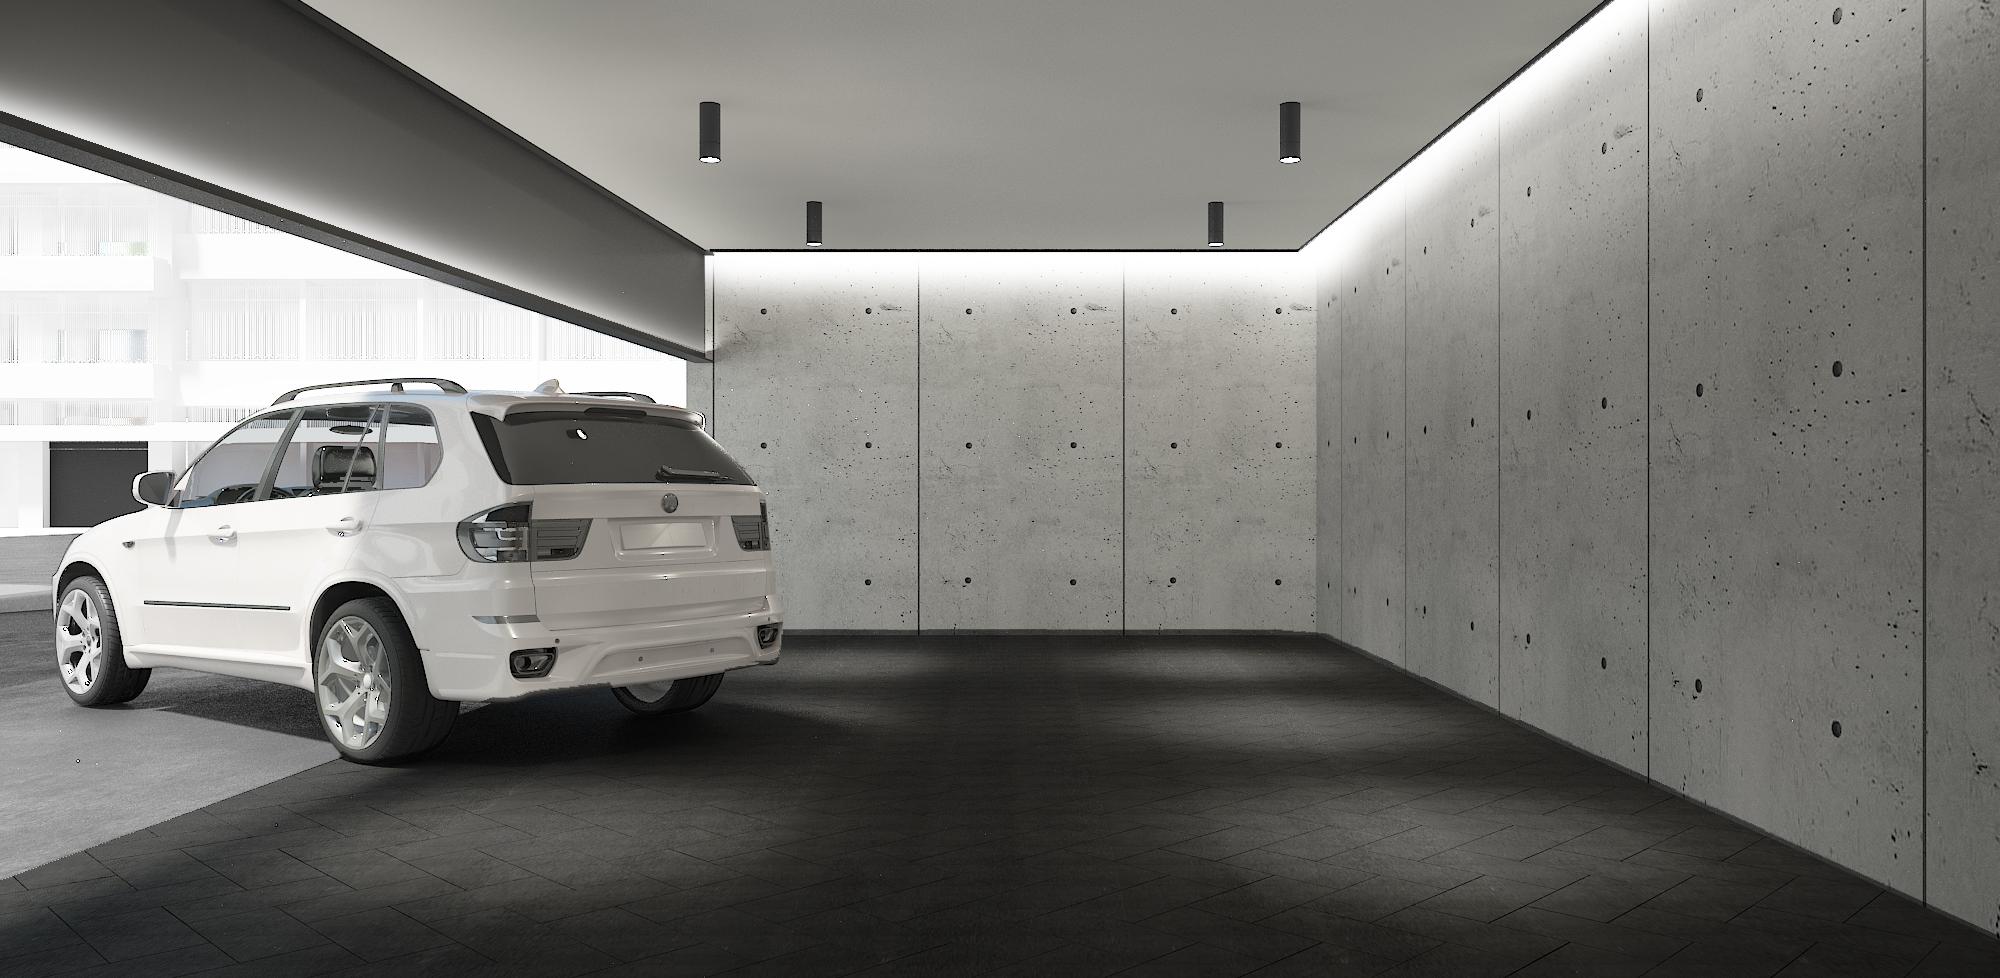 02 Parking 01